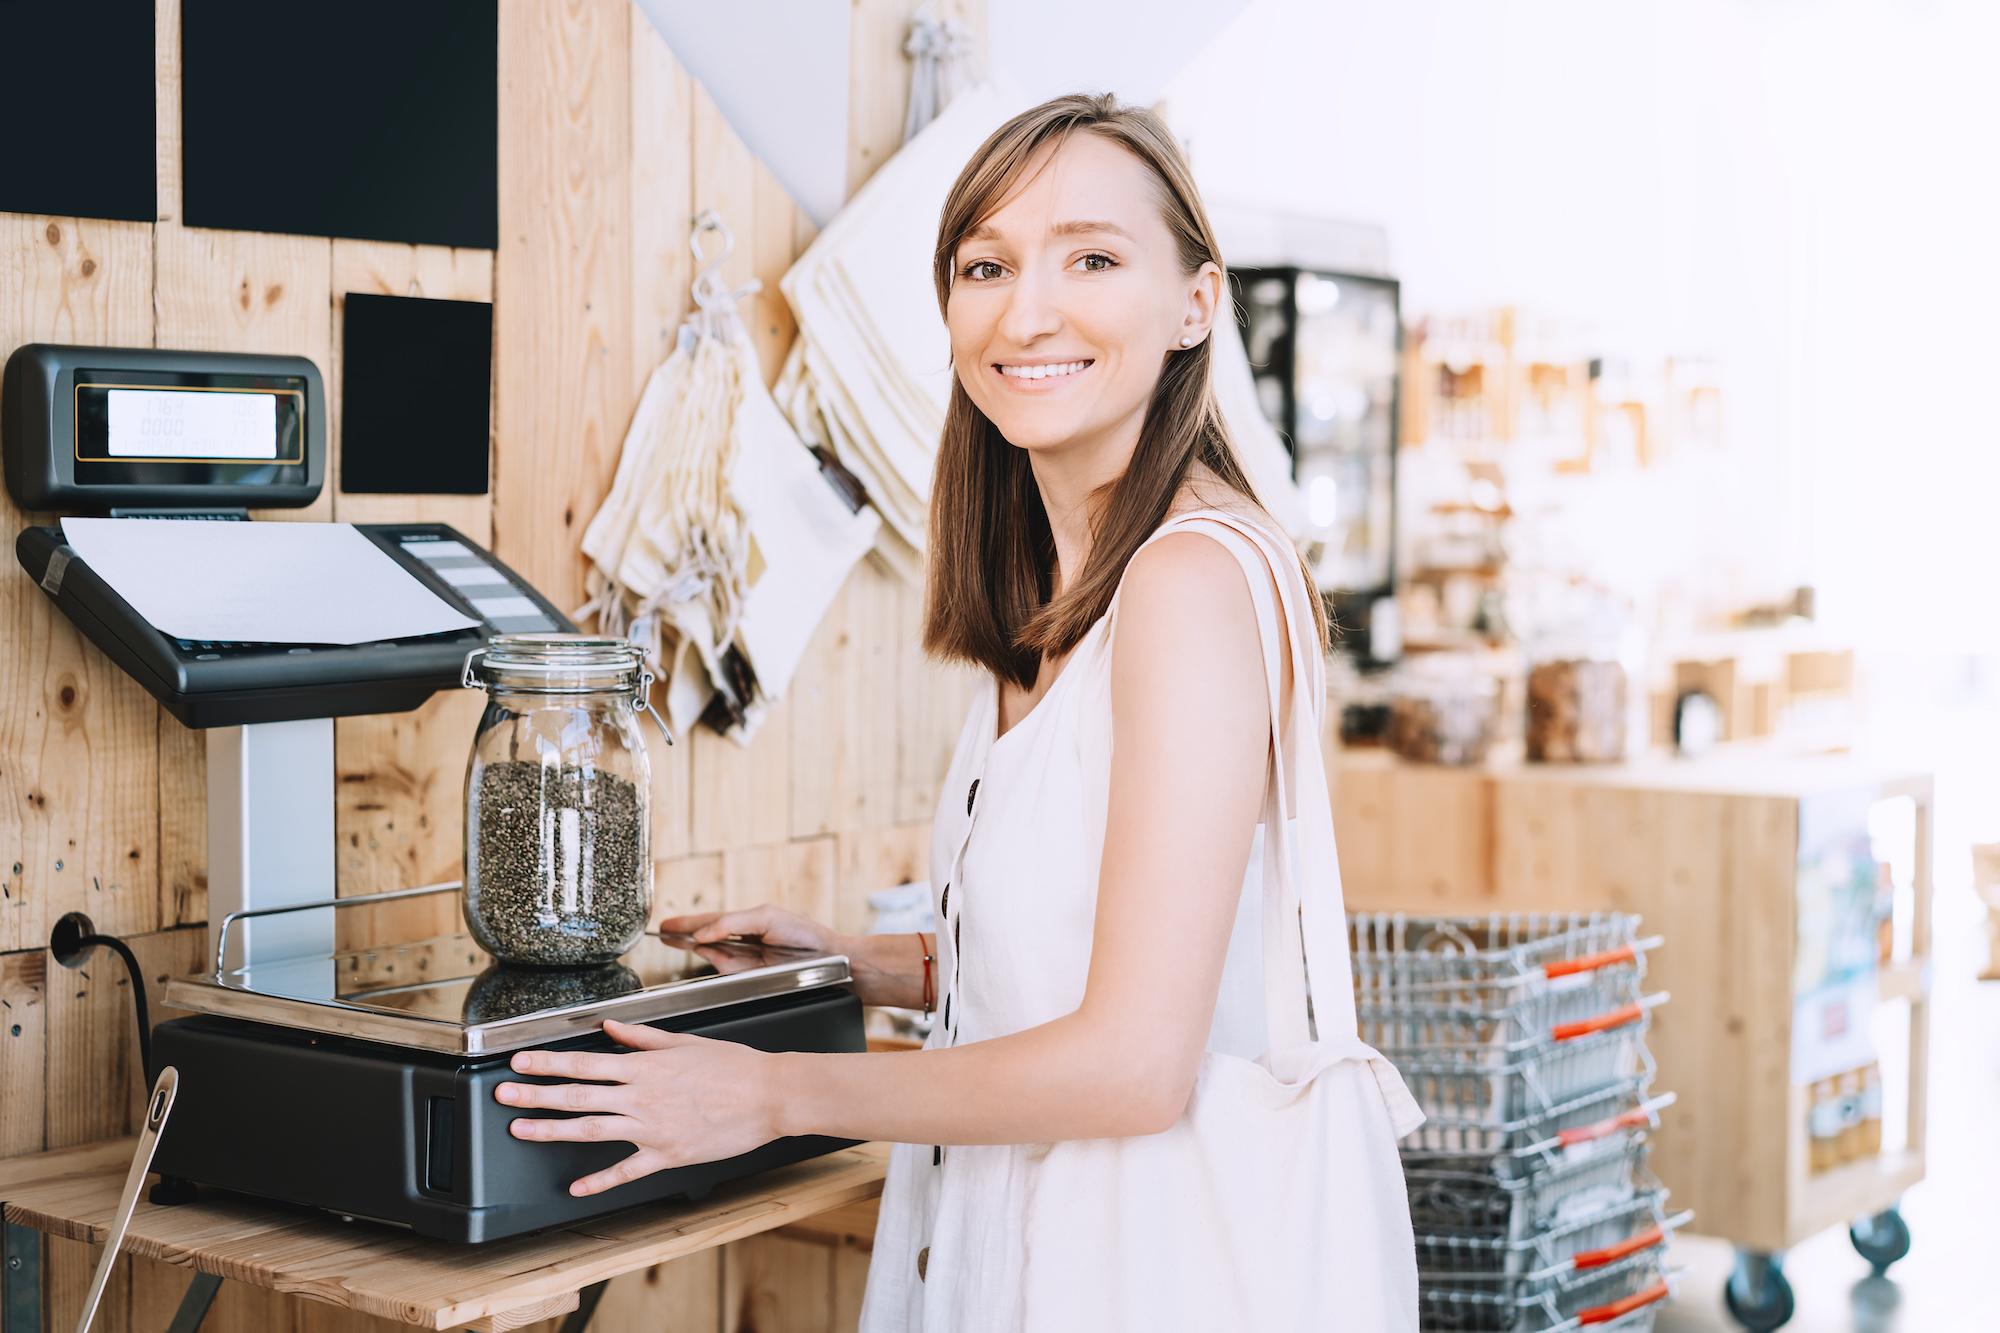 woman-weighs-cannabis-jar